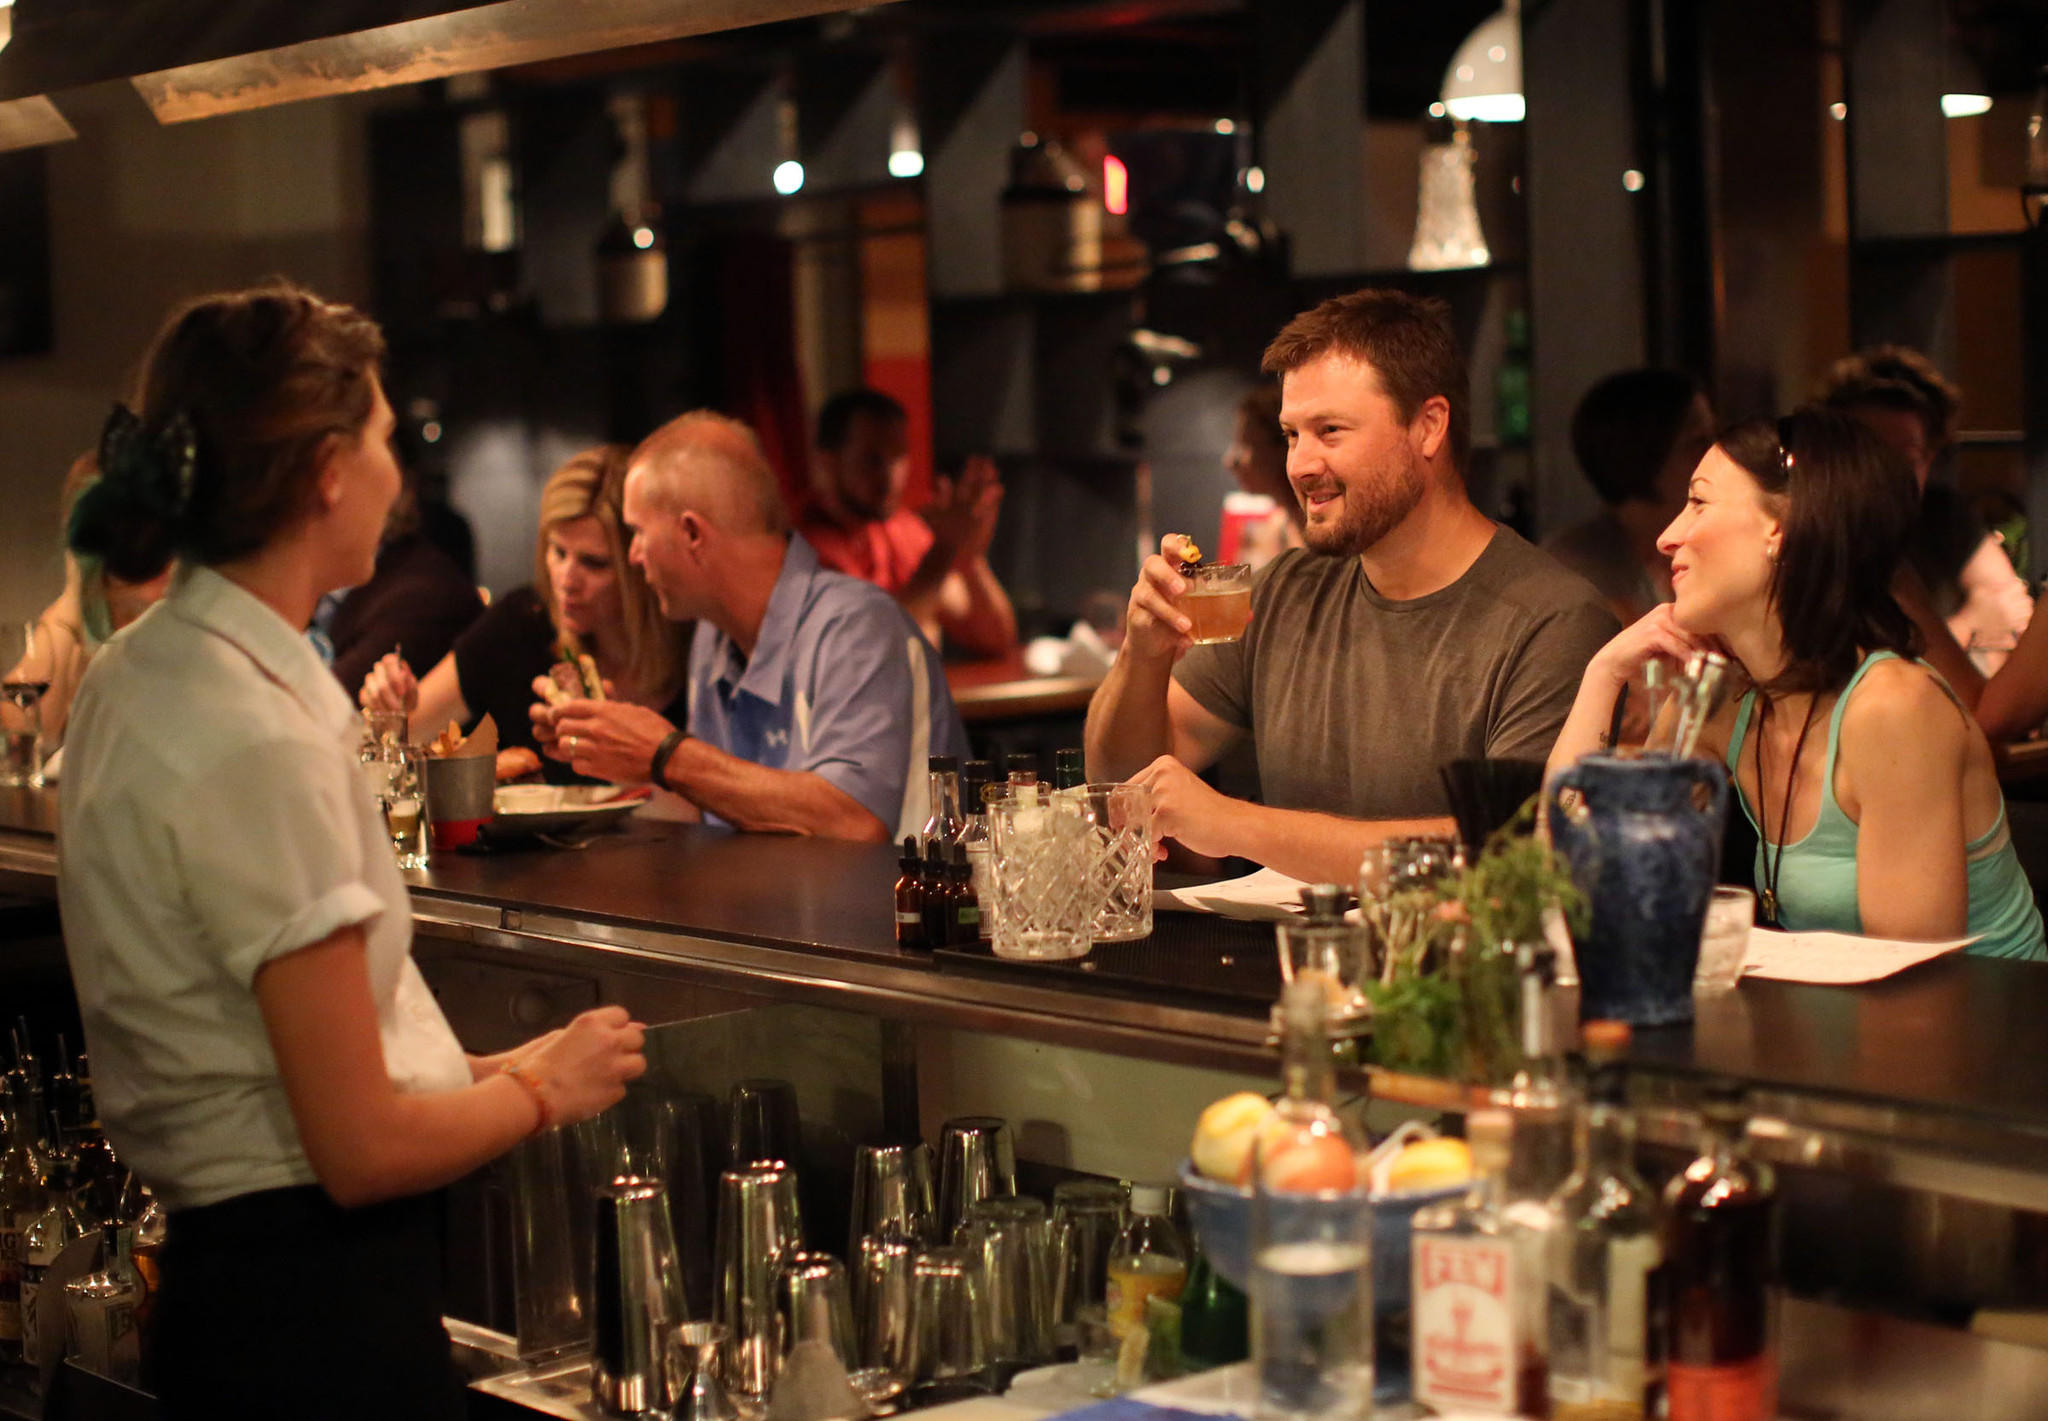 Beating the heat at le garage beer bar frites in hampden - Le garage restaurant montbonnot ...